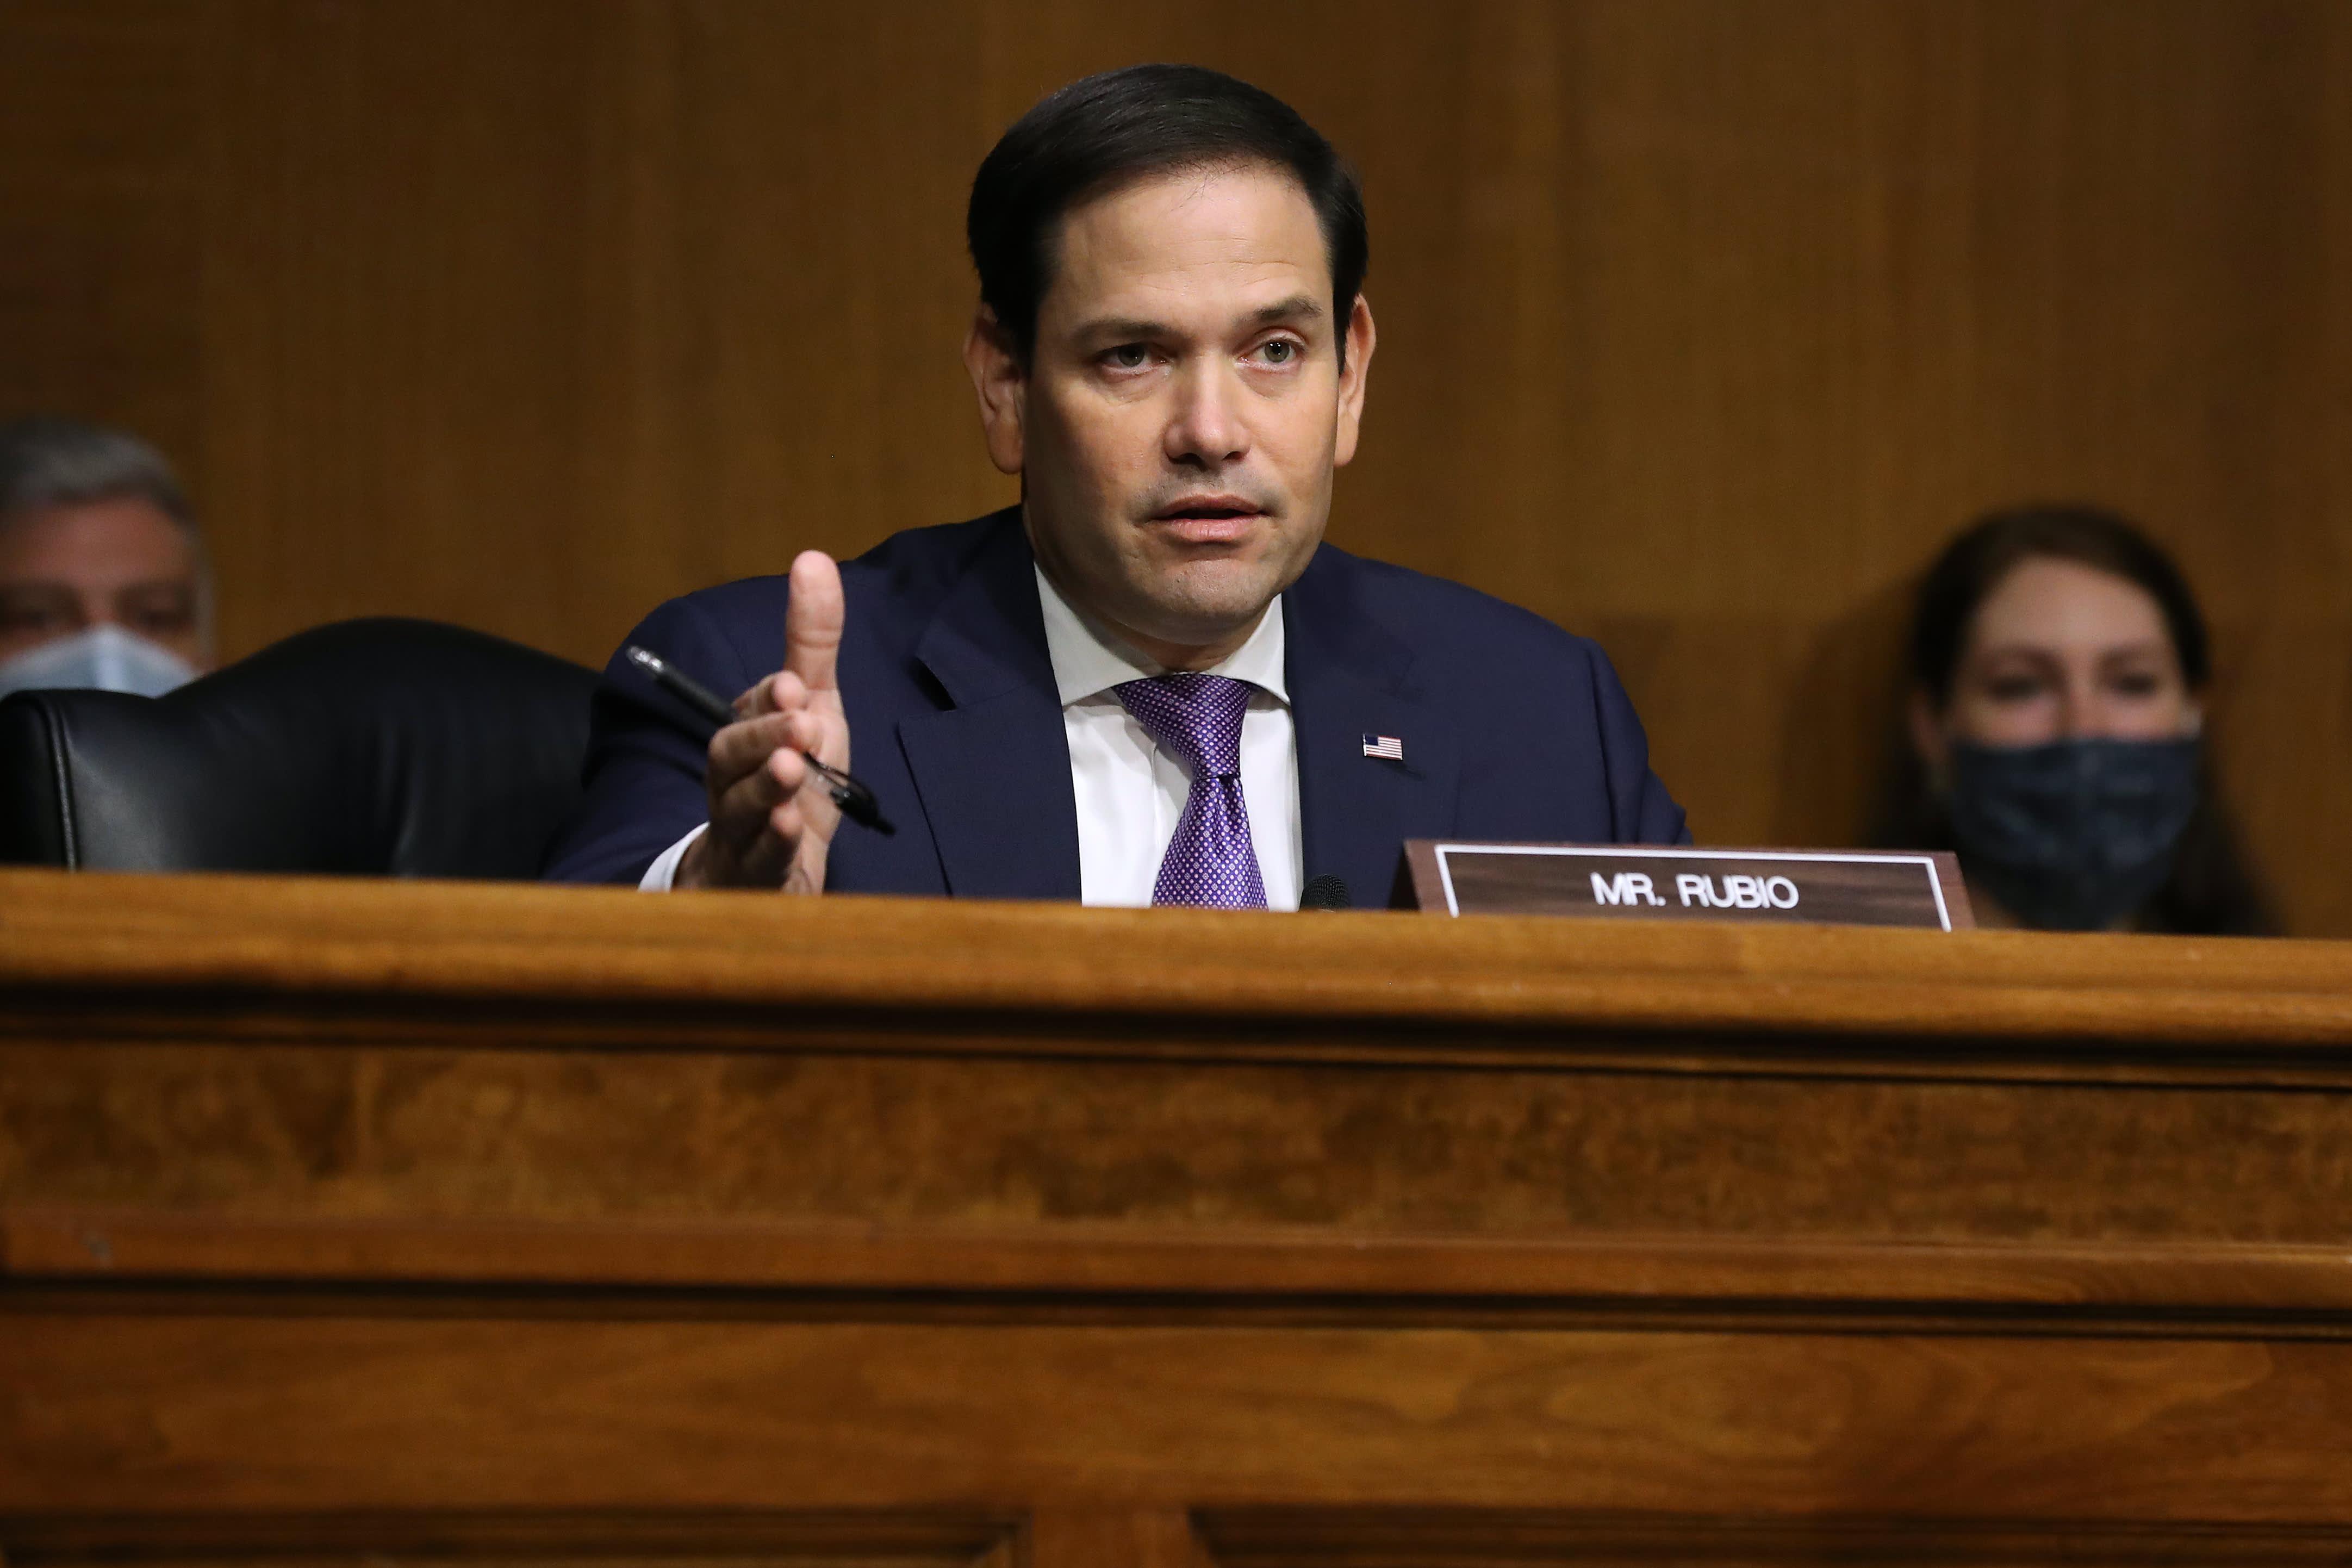 Marco Rubio endorses Amazon unionization effort bringing bipartisan support – CNBC